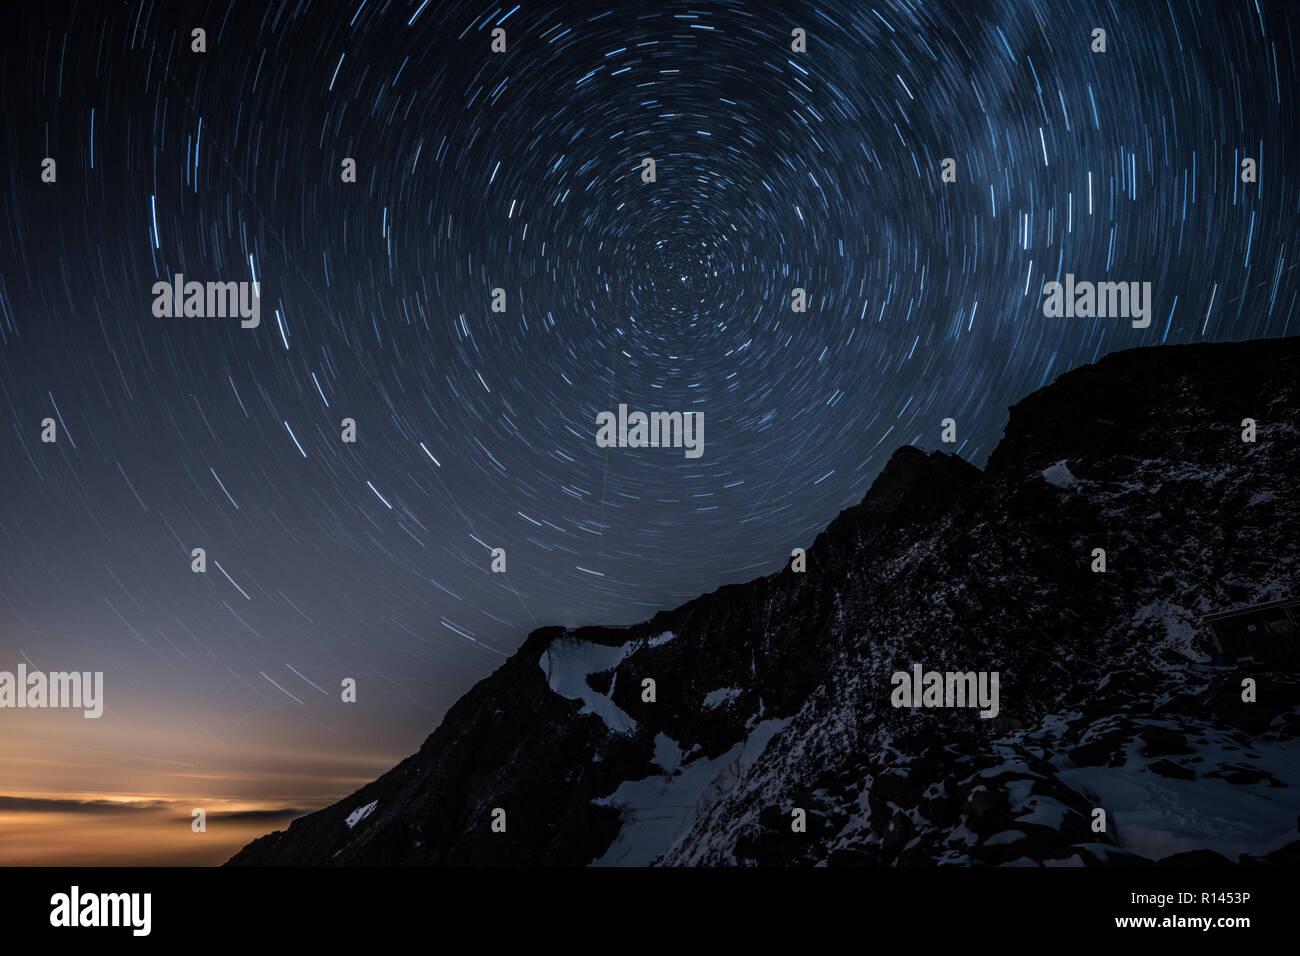 Night sky star trails above Aiguille de Bionnassay mountain, Alps, France Stock Photo